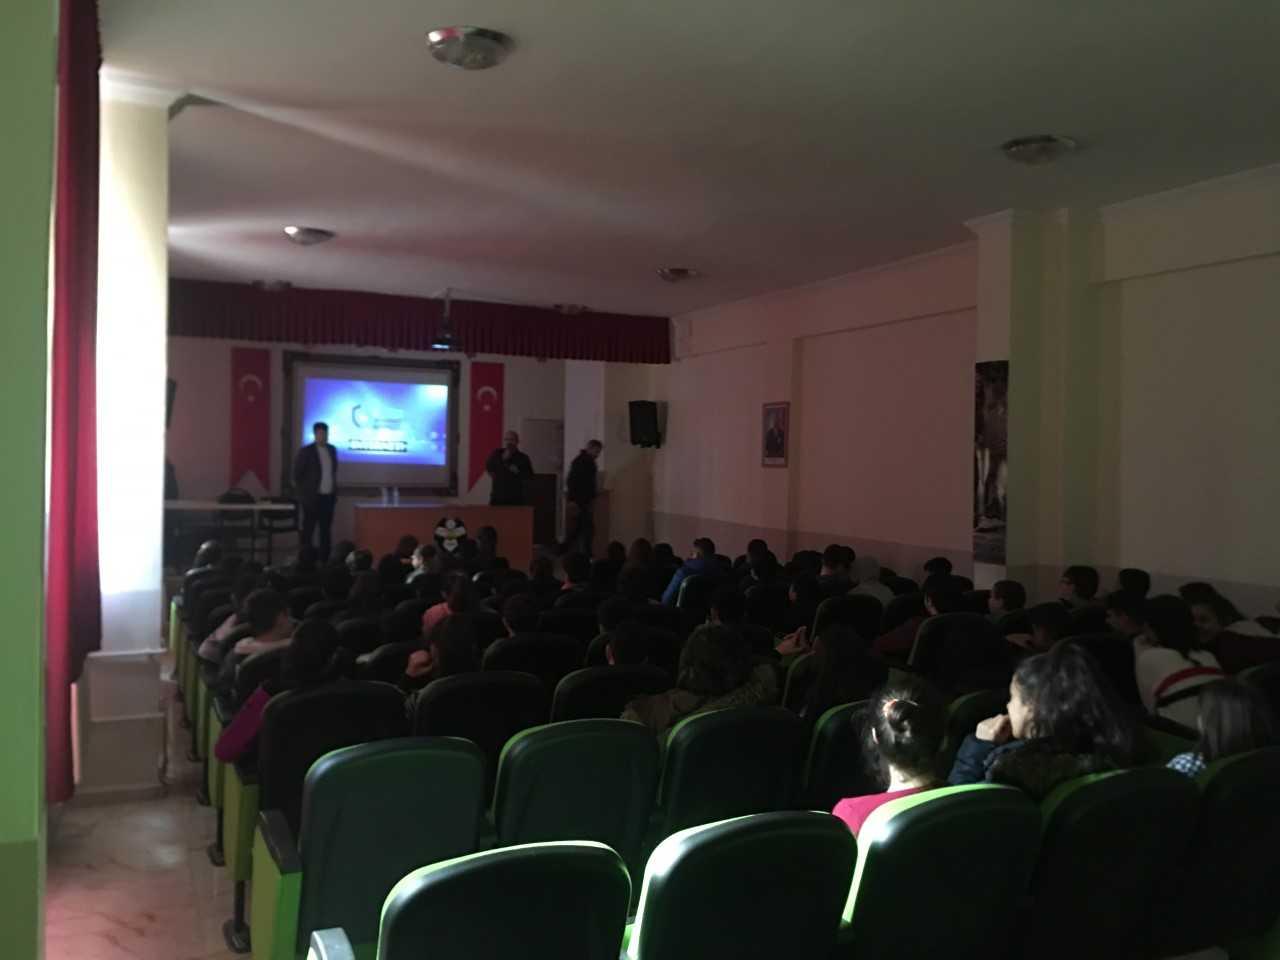 Tokat Halil Rıfat Paşa Ortaokulunda, Bilinçli Ve Güvenli İnternet Semineri